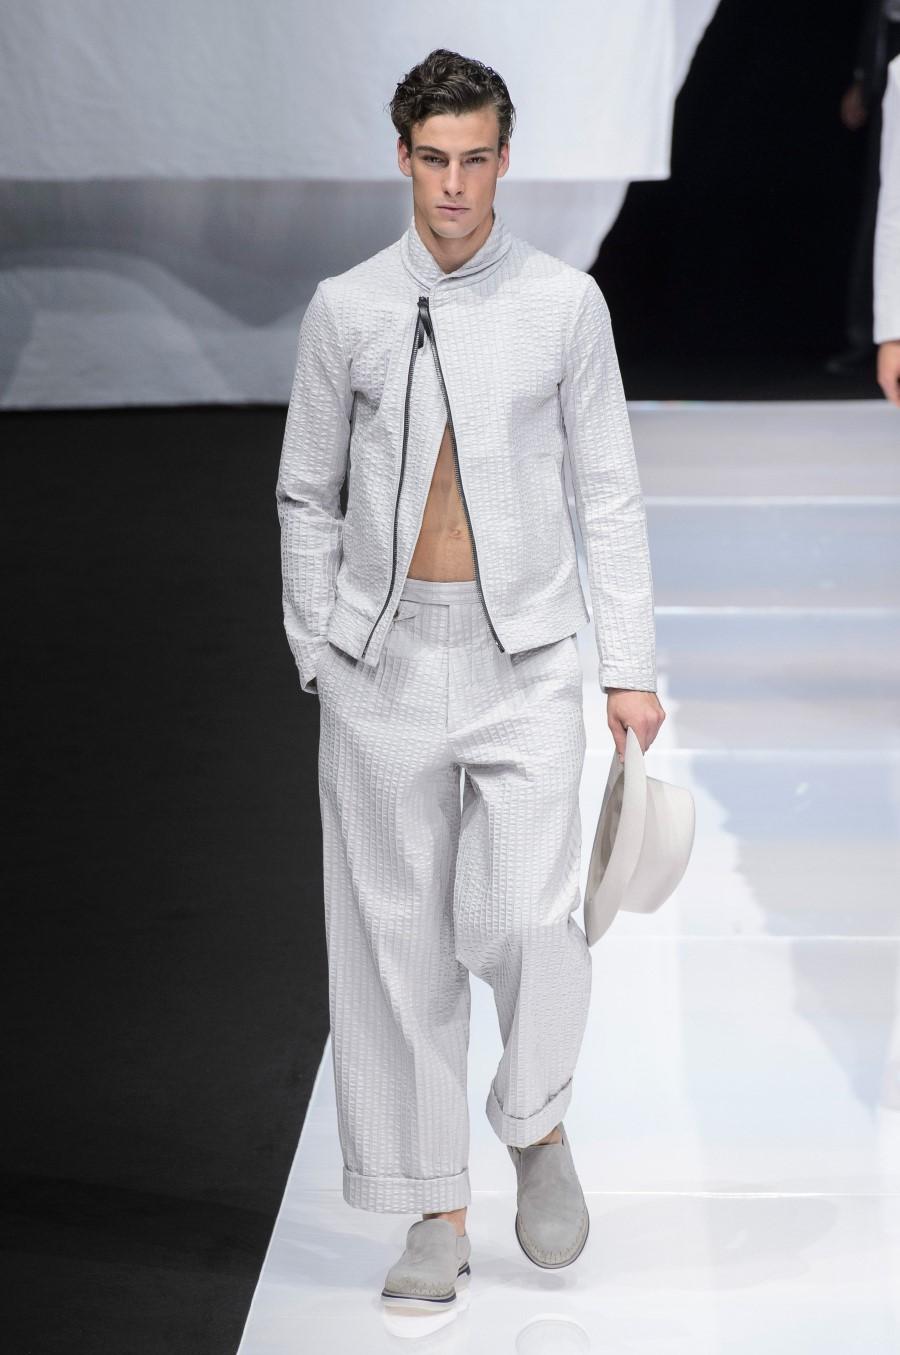 Giorgio Armani Spring Summer 2019 - Milan Fashion Week